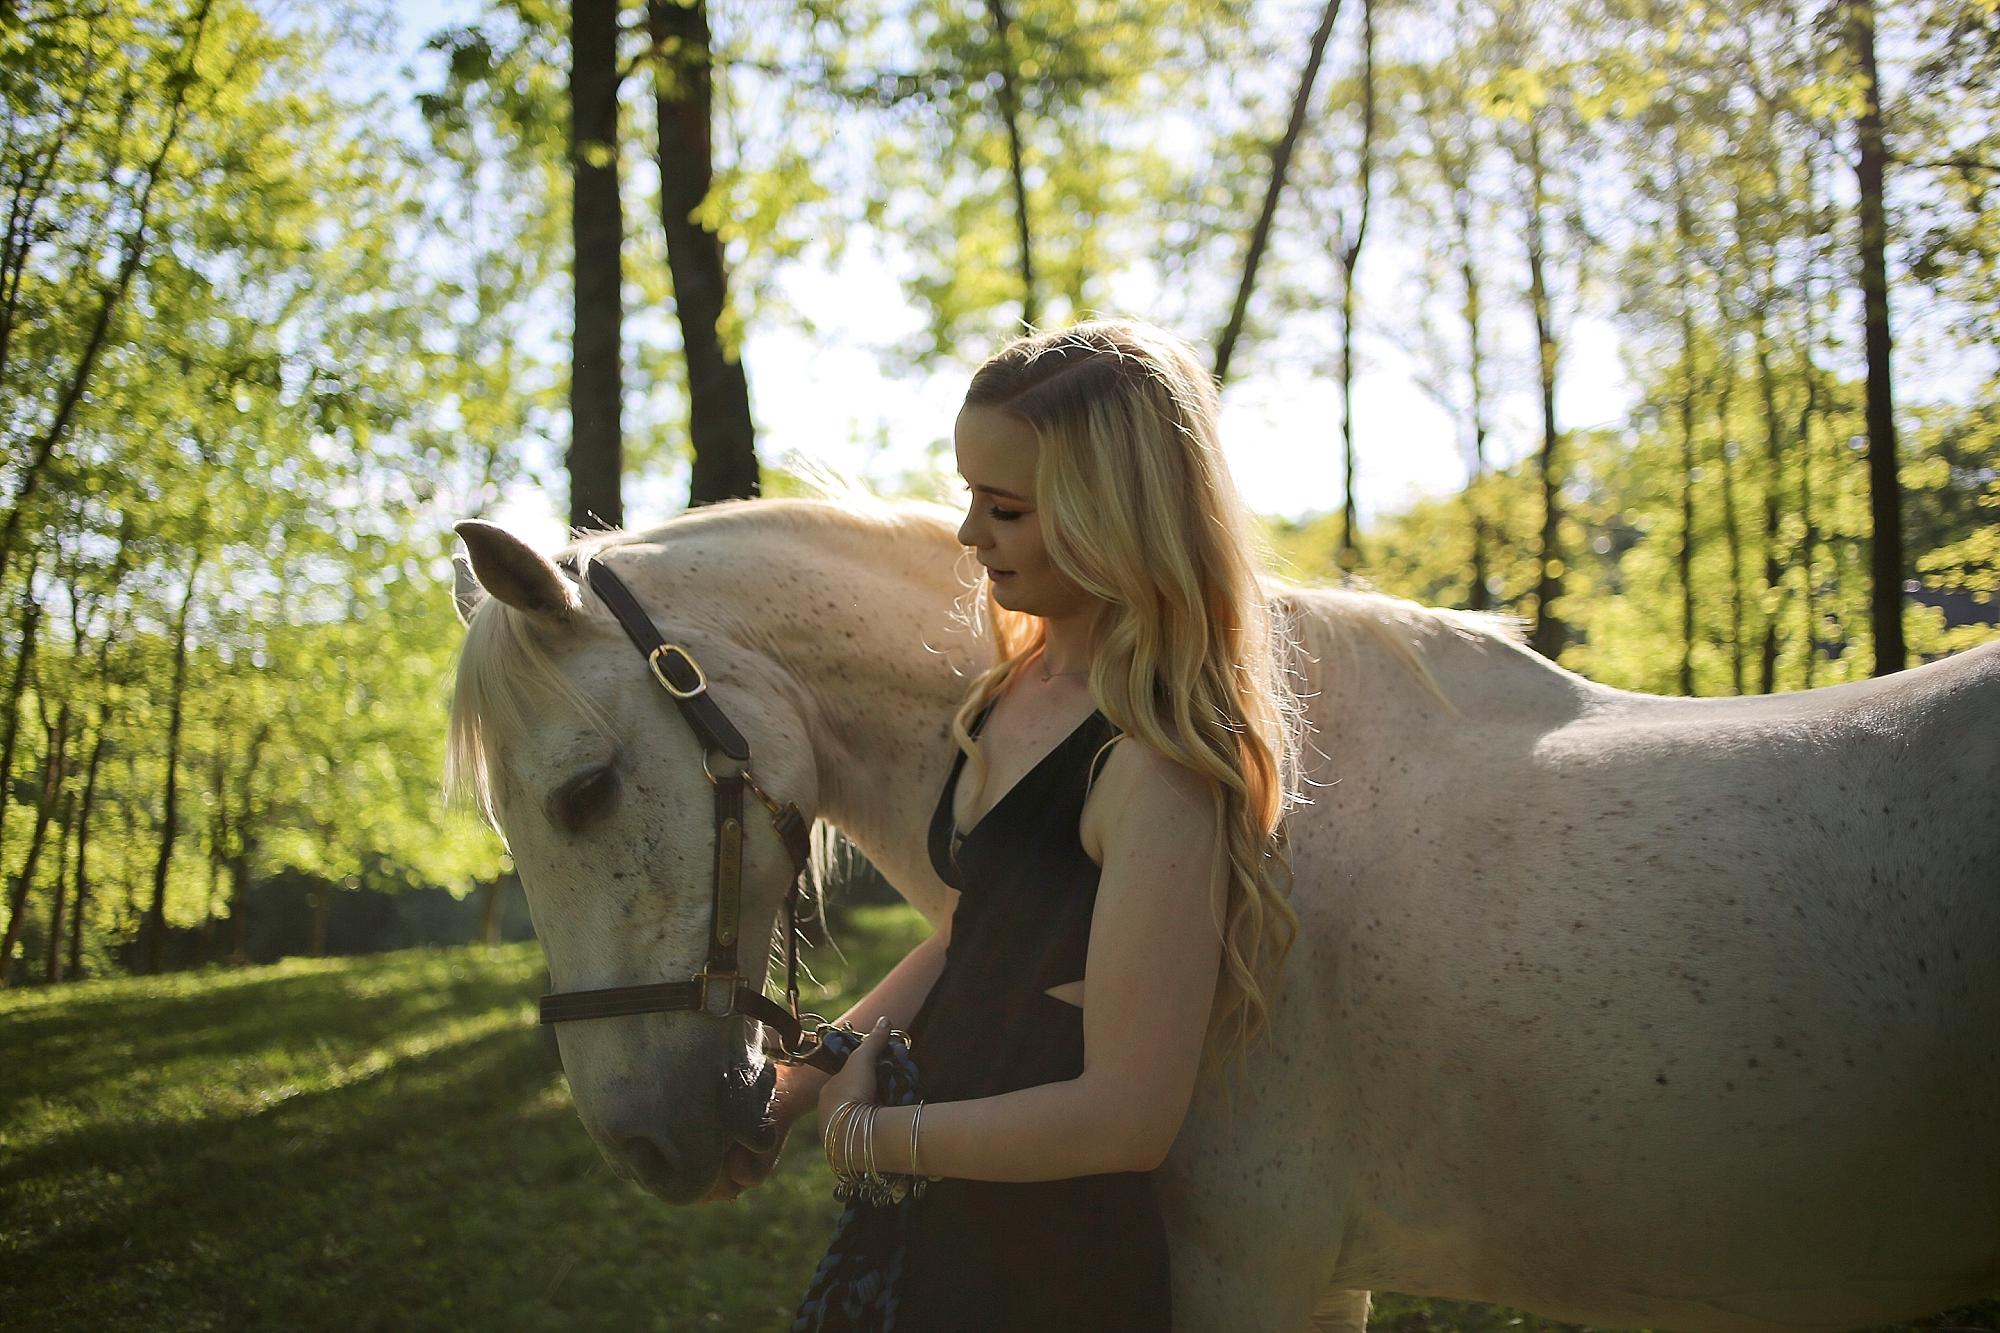 Molly | Virginia Tech Senior Portraits with Horses